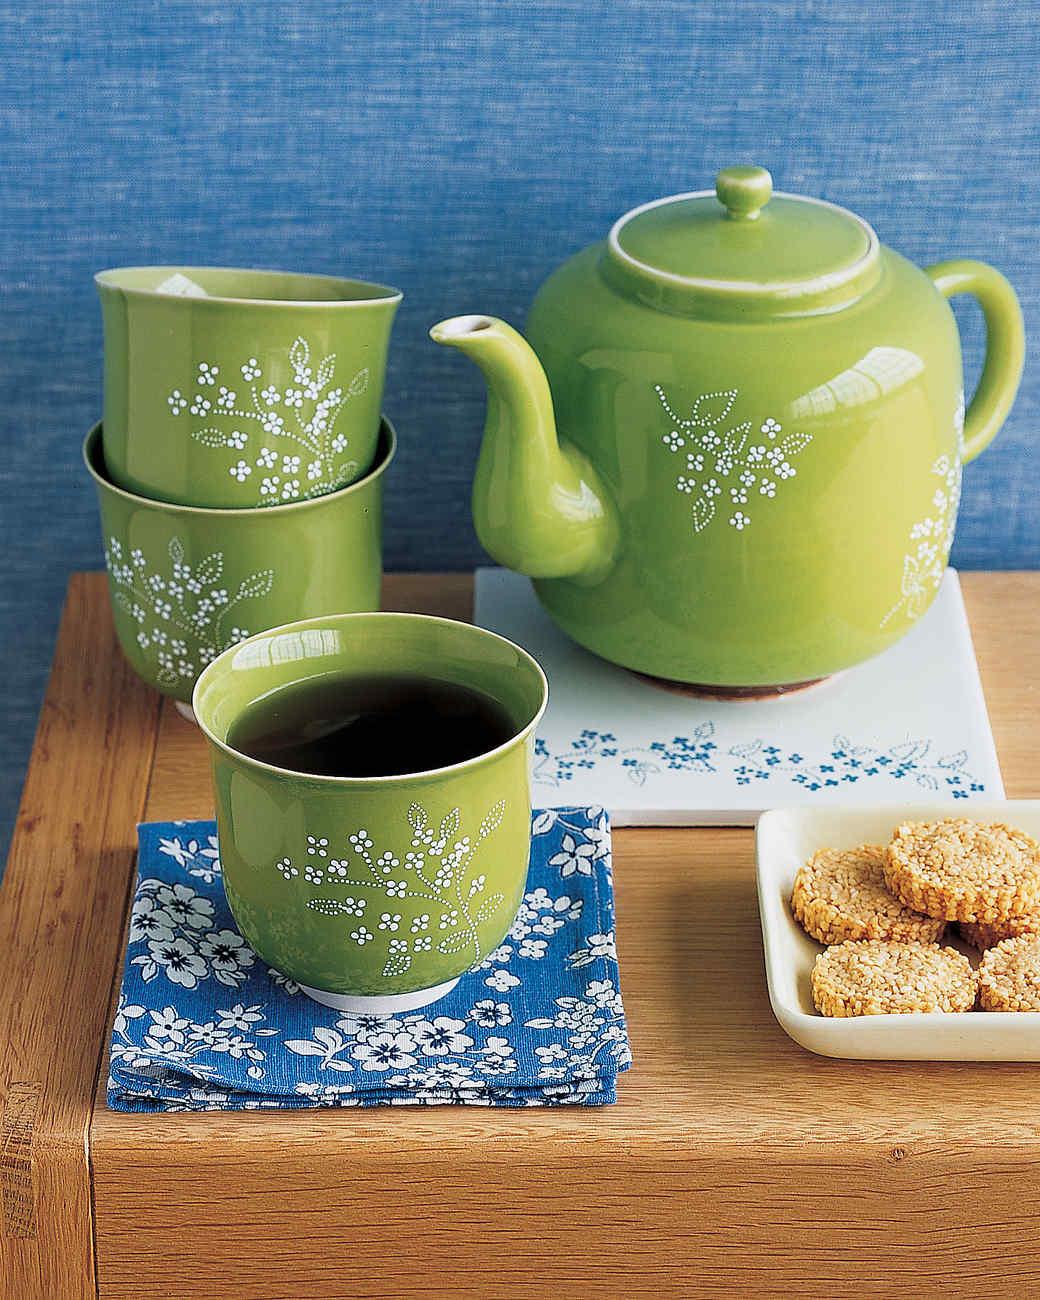 mla101770_0106_teapot.jpg